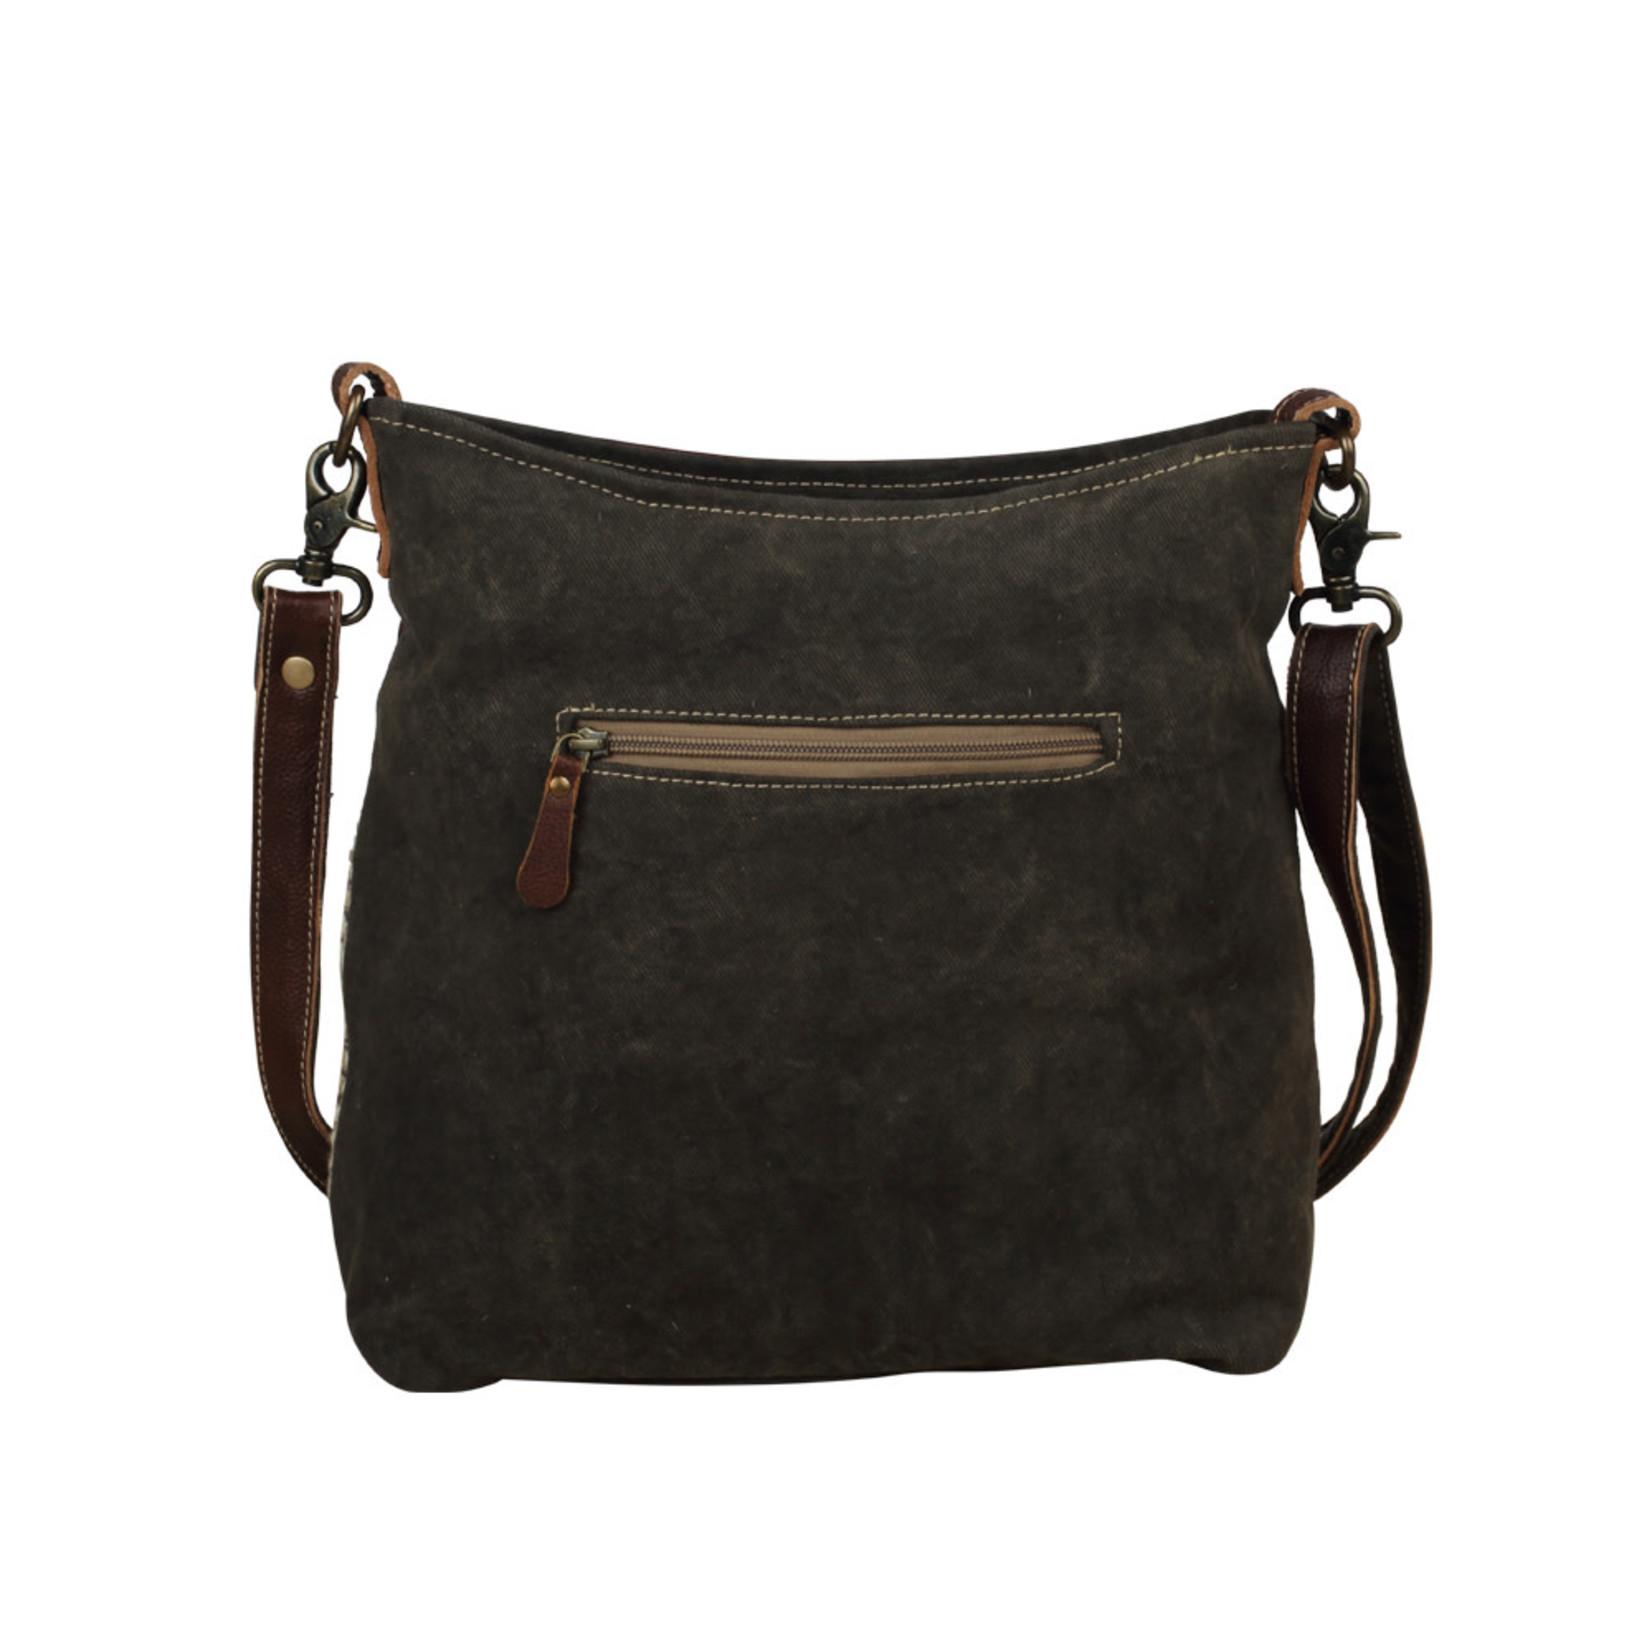 Myra Bags S-2083 Virtue Shoulder Bag